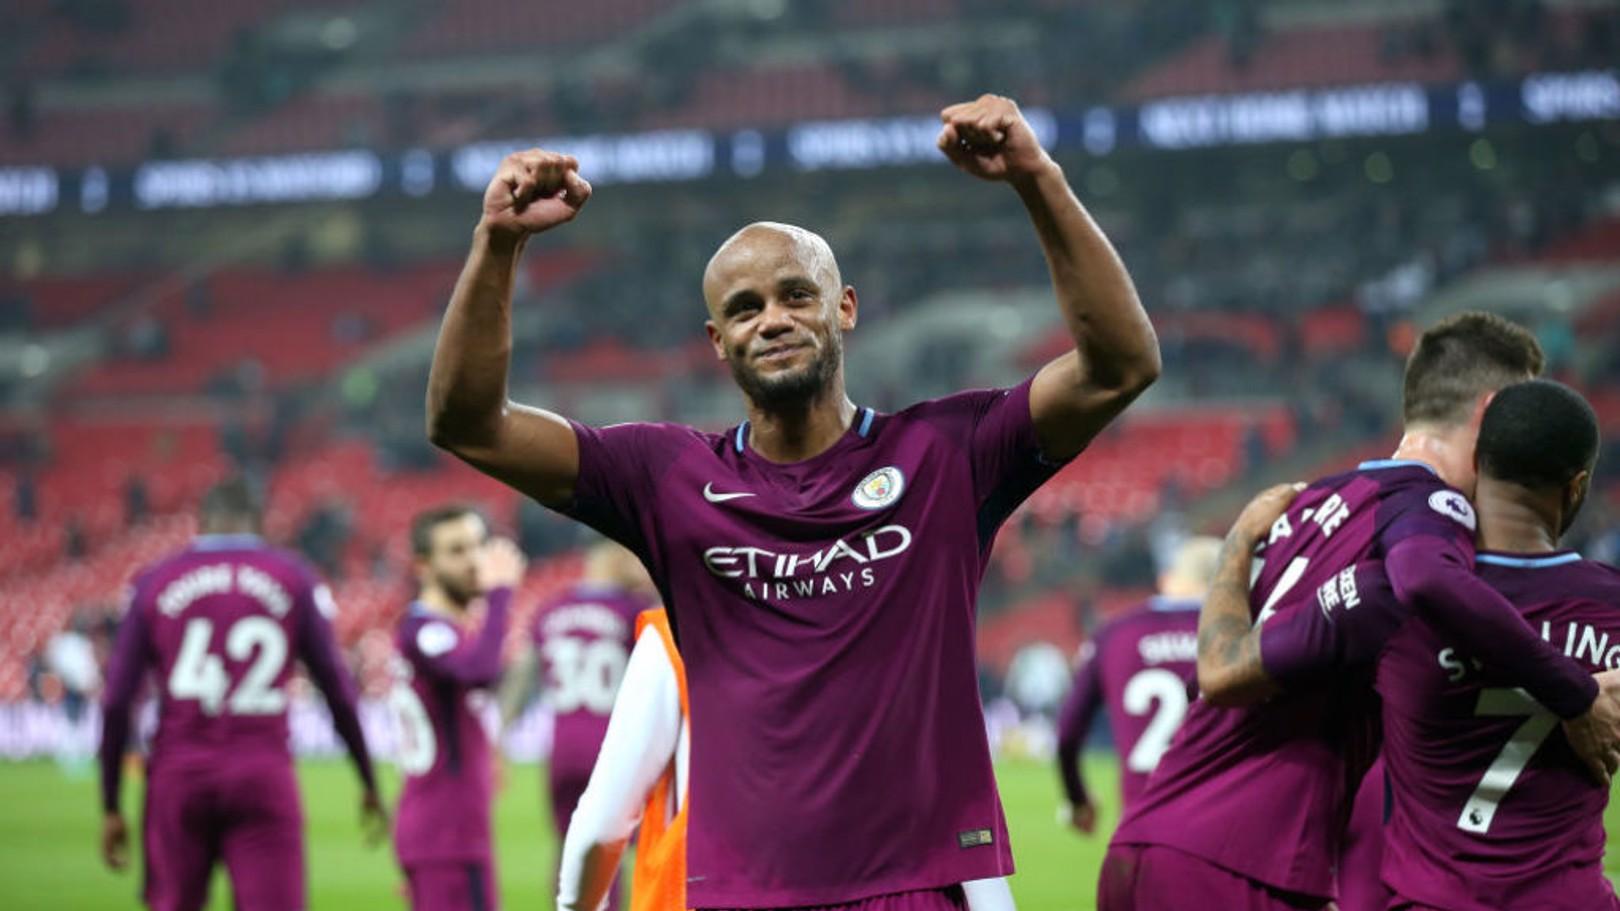 WEMBLEY WONDERS: Flashback to last season and Vincent Kompany celebrates after City's 3-1 win against Tottenham at Wembley